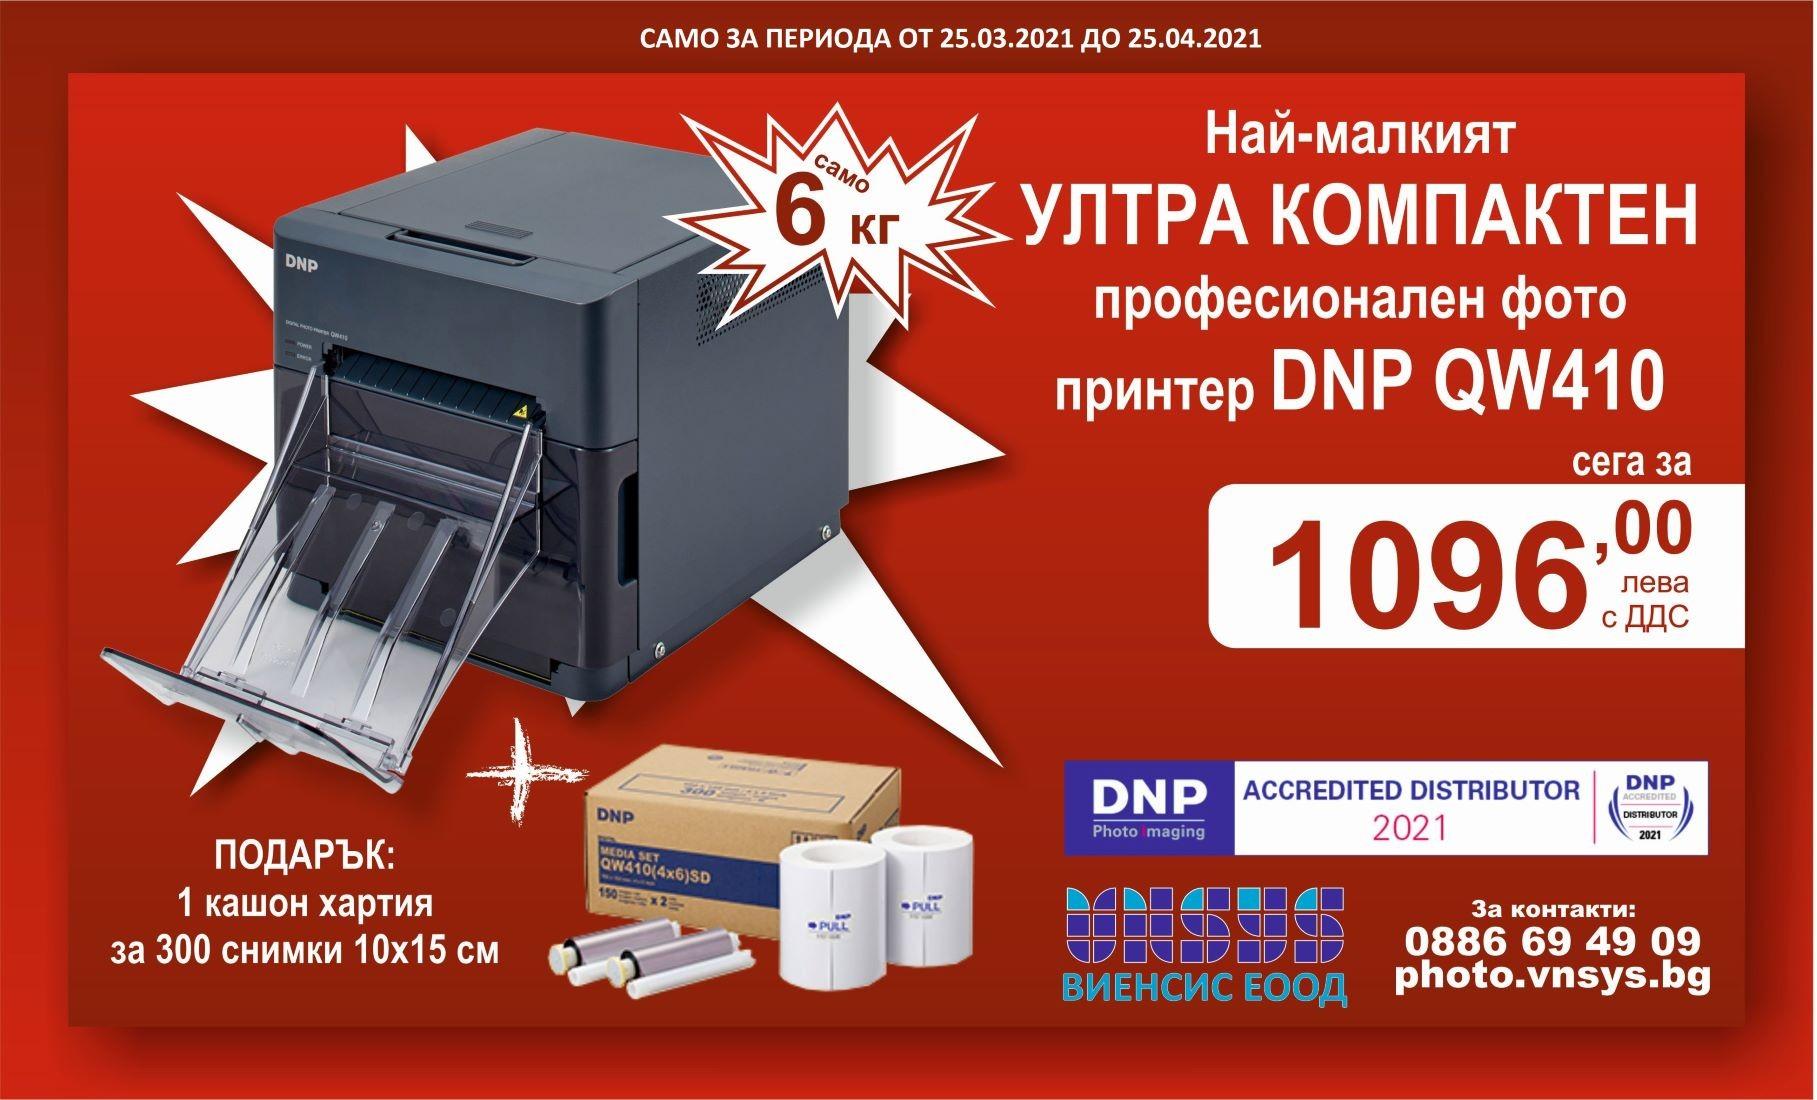 Photo printer